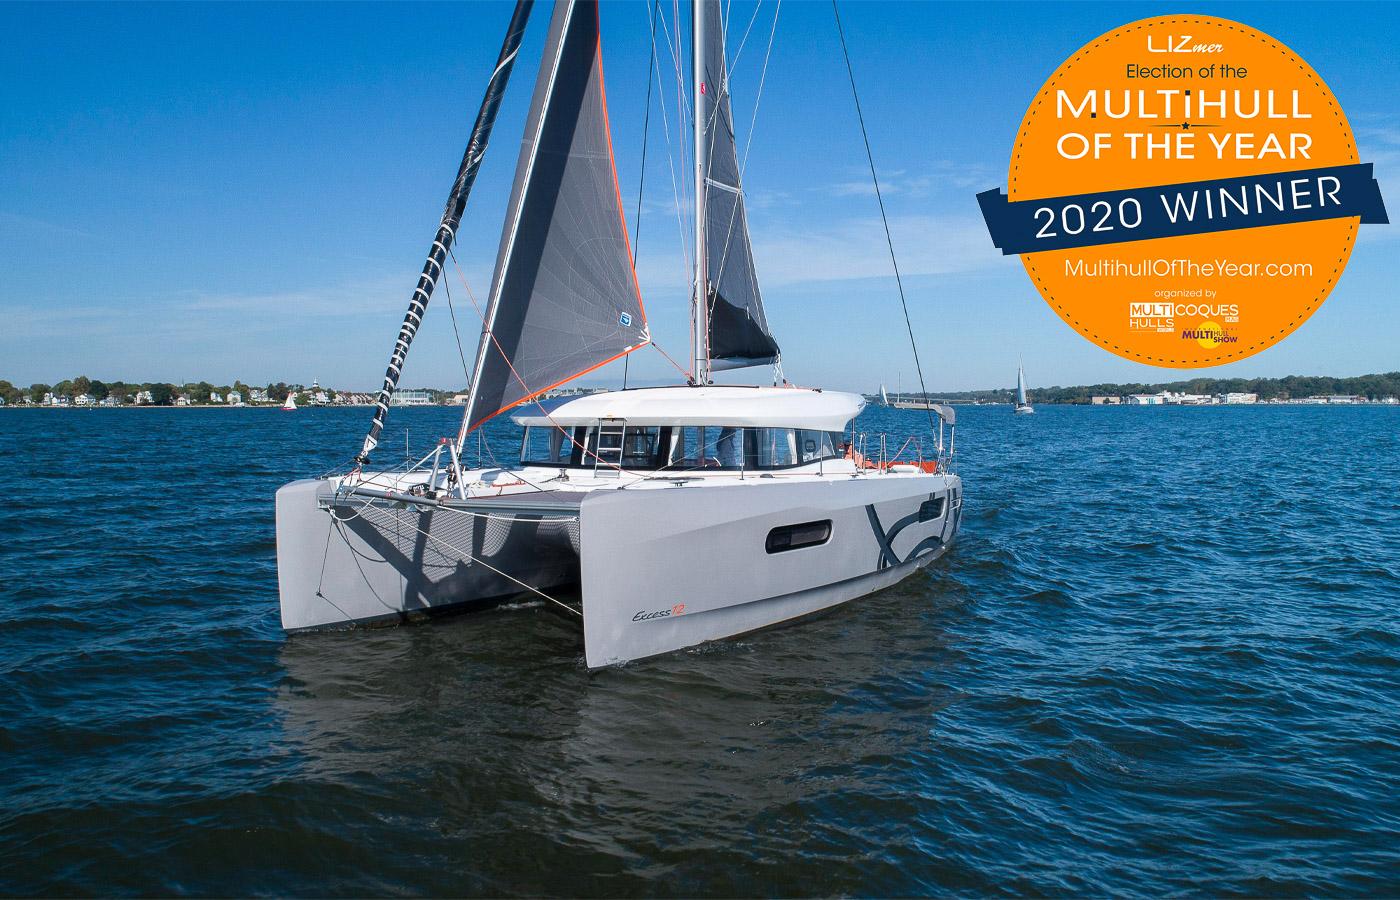 Excess 12 Catamaran Wins Multihull Of The Year [Yacht Highlight]